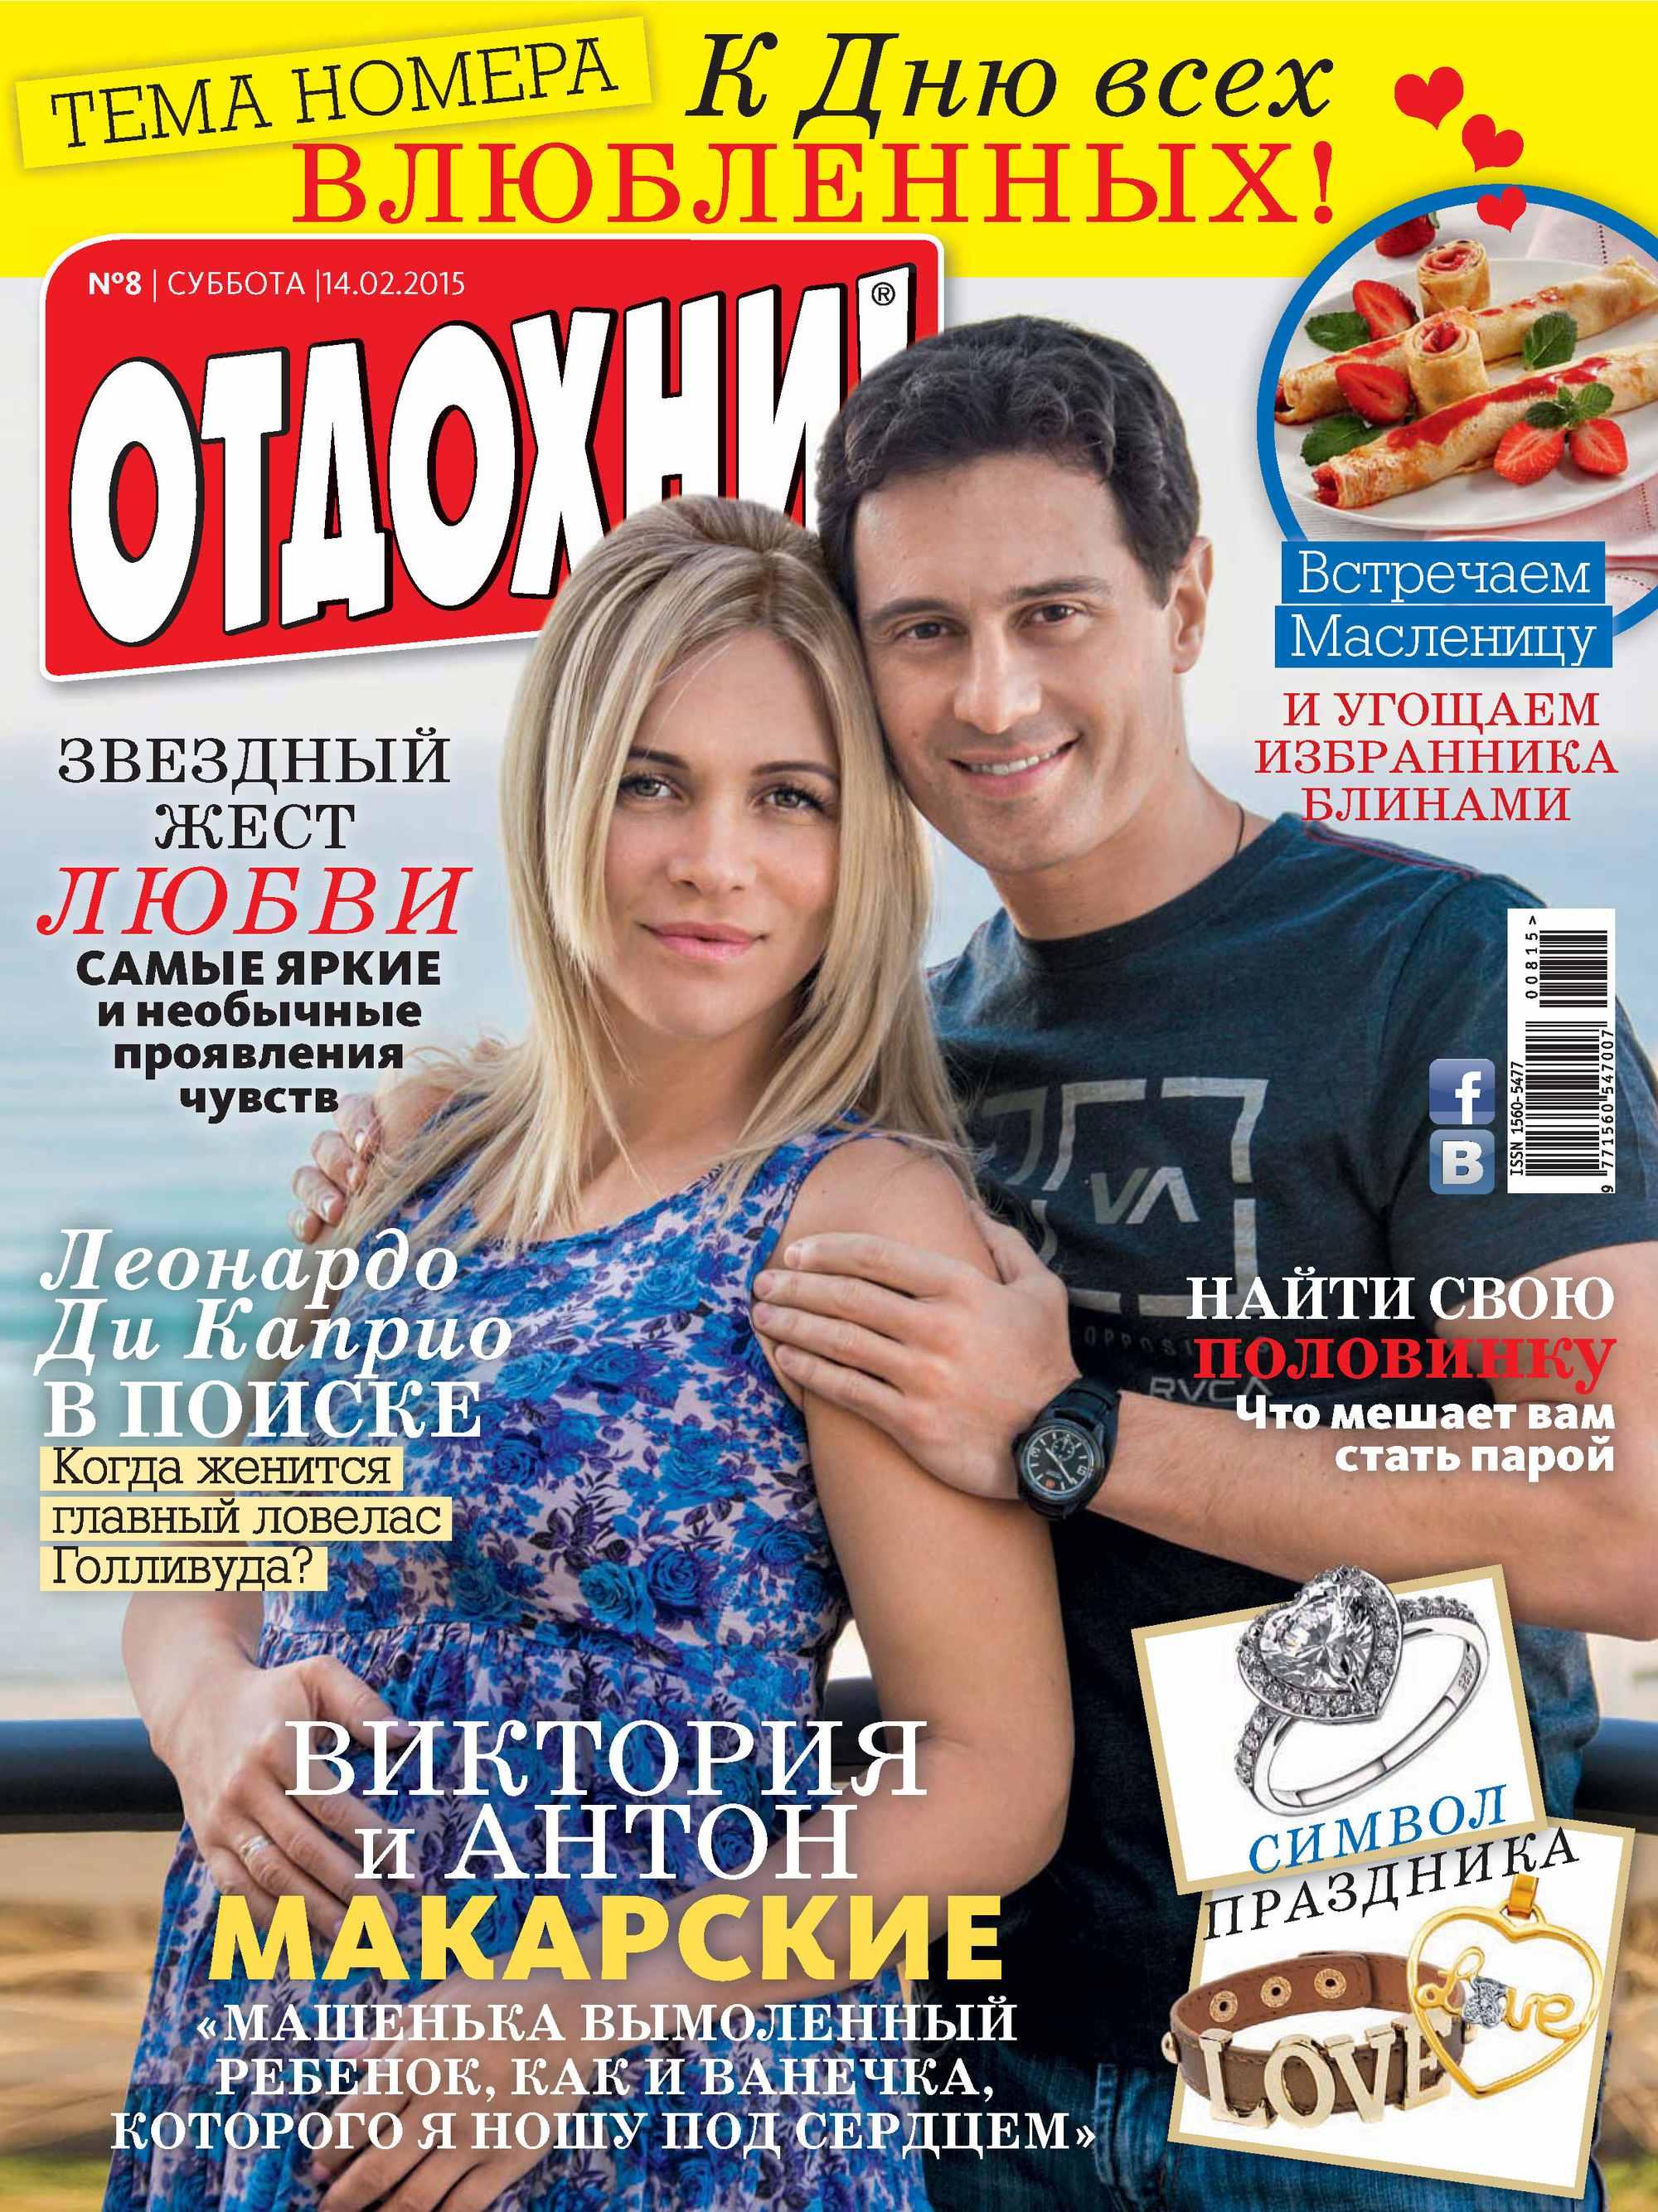 ИД «Бурда» Журнал «Отдохни!» №08/2015 ид бурда журнал отдохни 30 2015